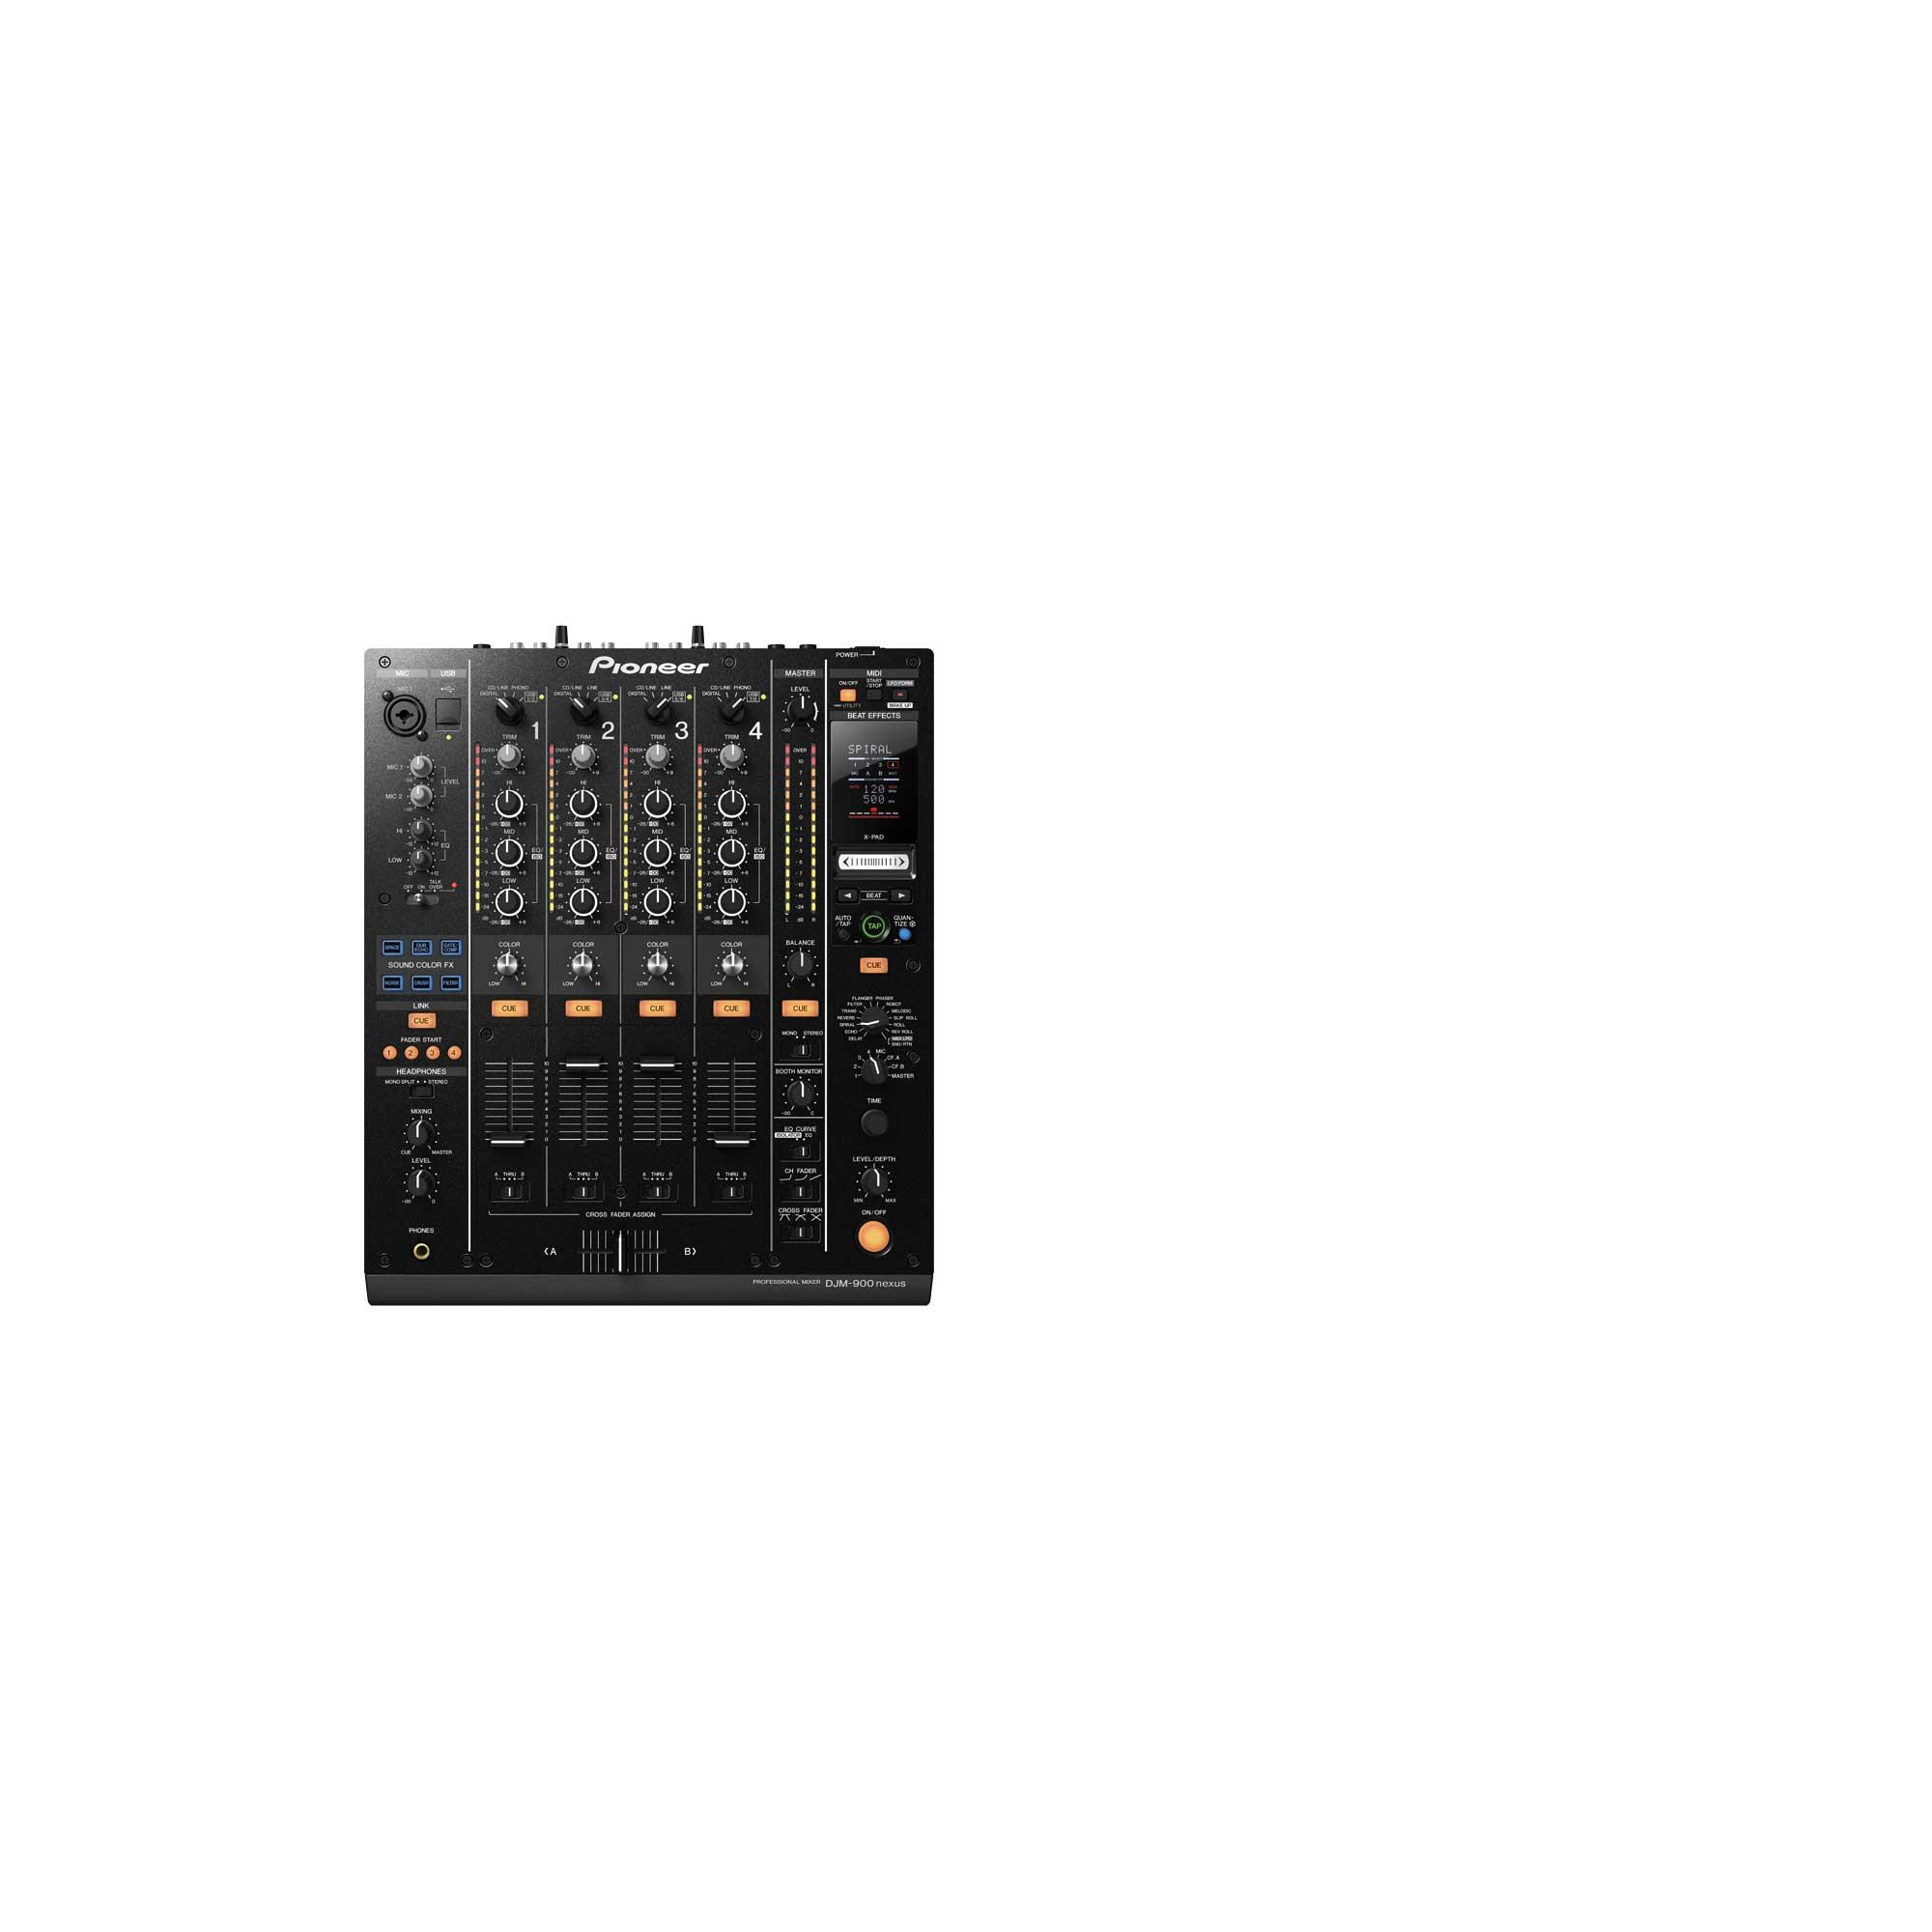 Pioneer's New DJM-900 Digital DJ Mixer Targets DJ's Life Savings